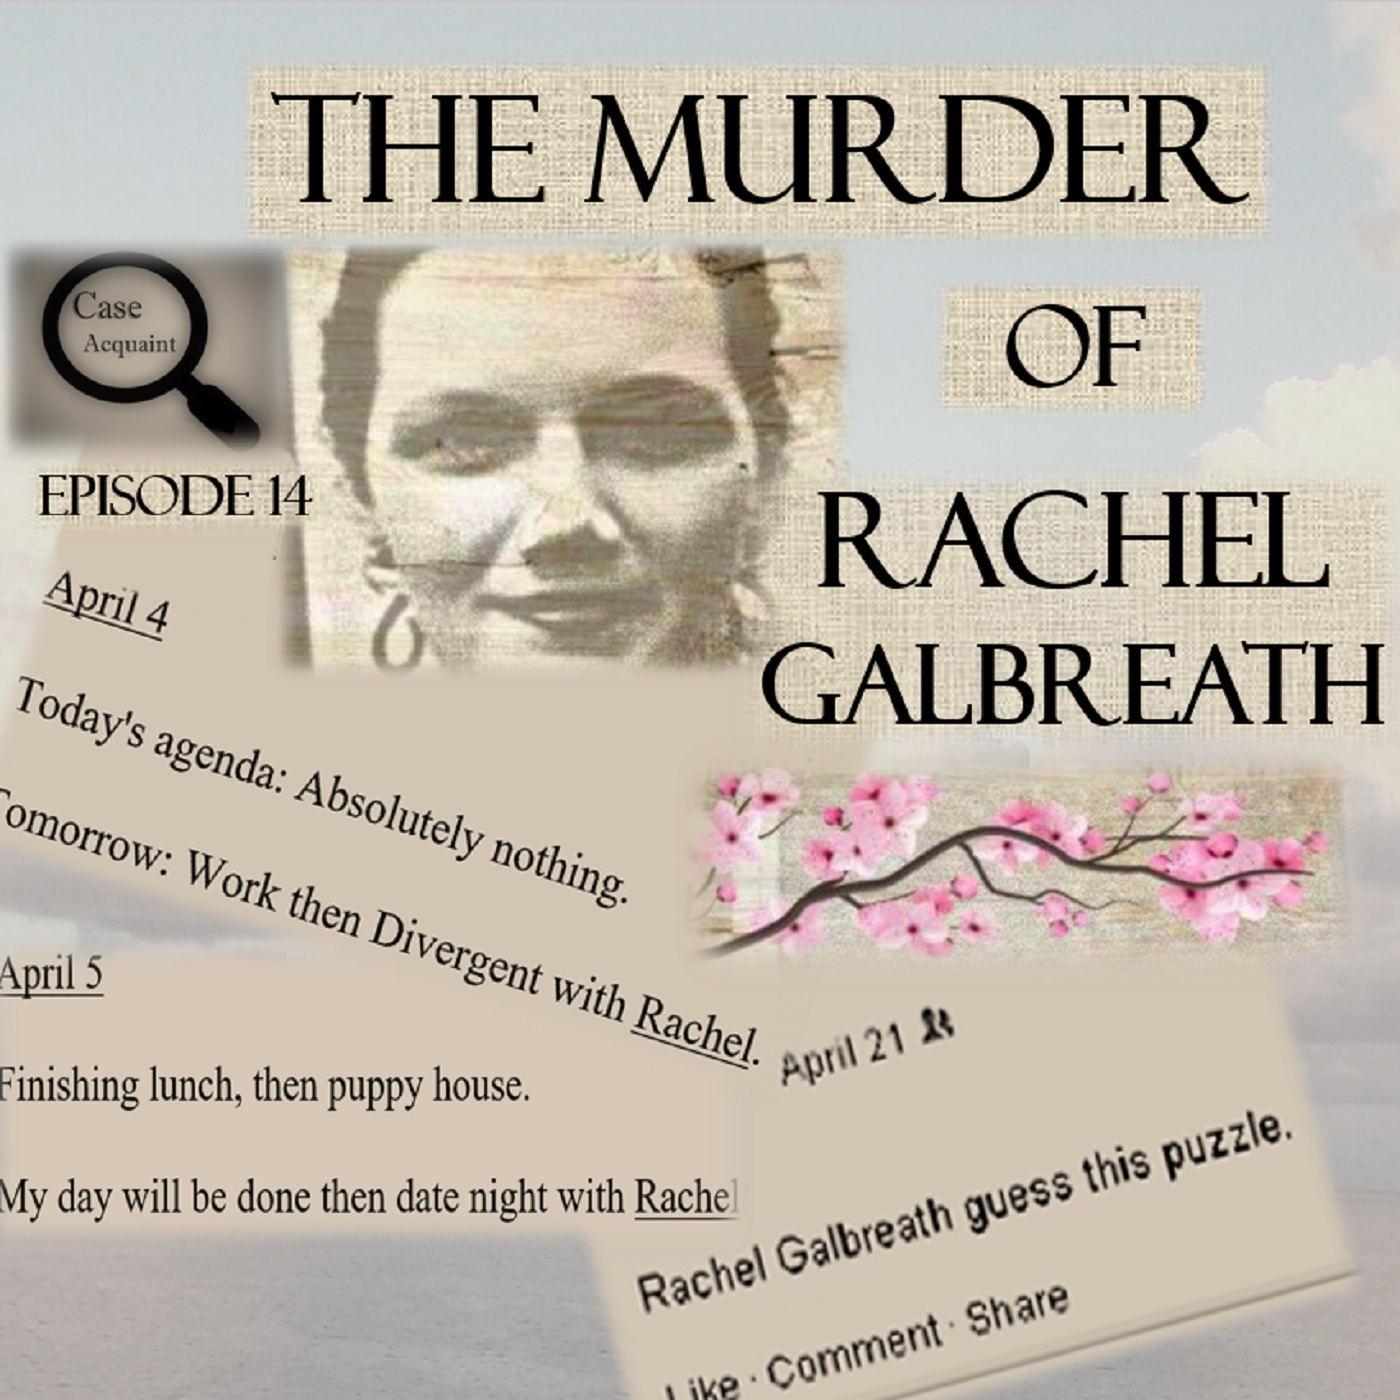 Episode 14 Rachel Galbreath